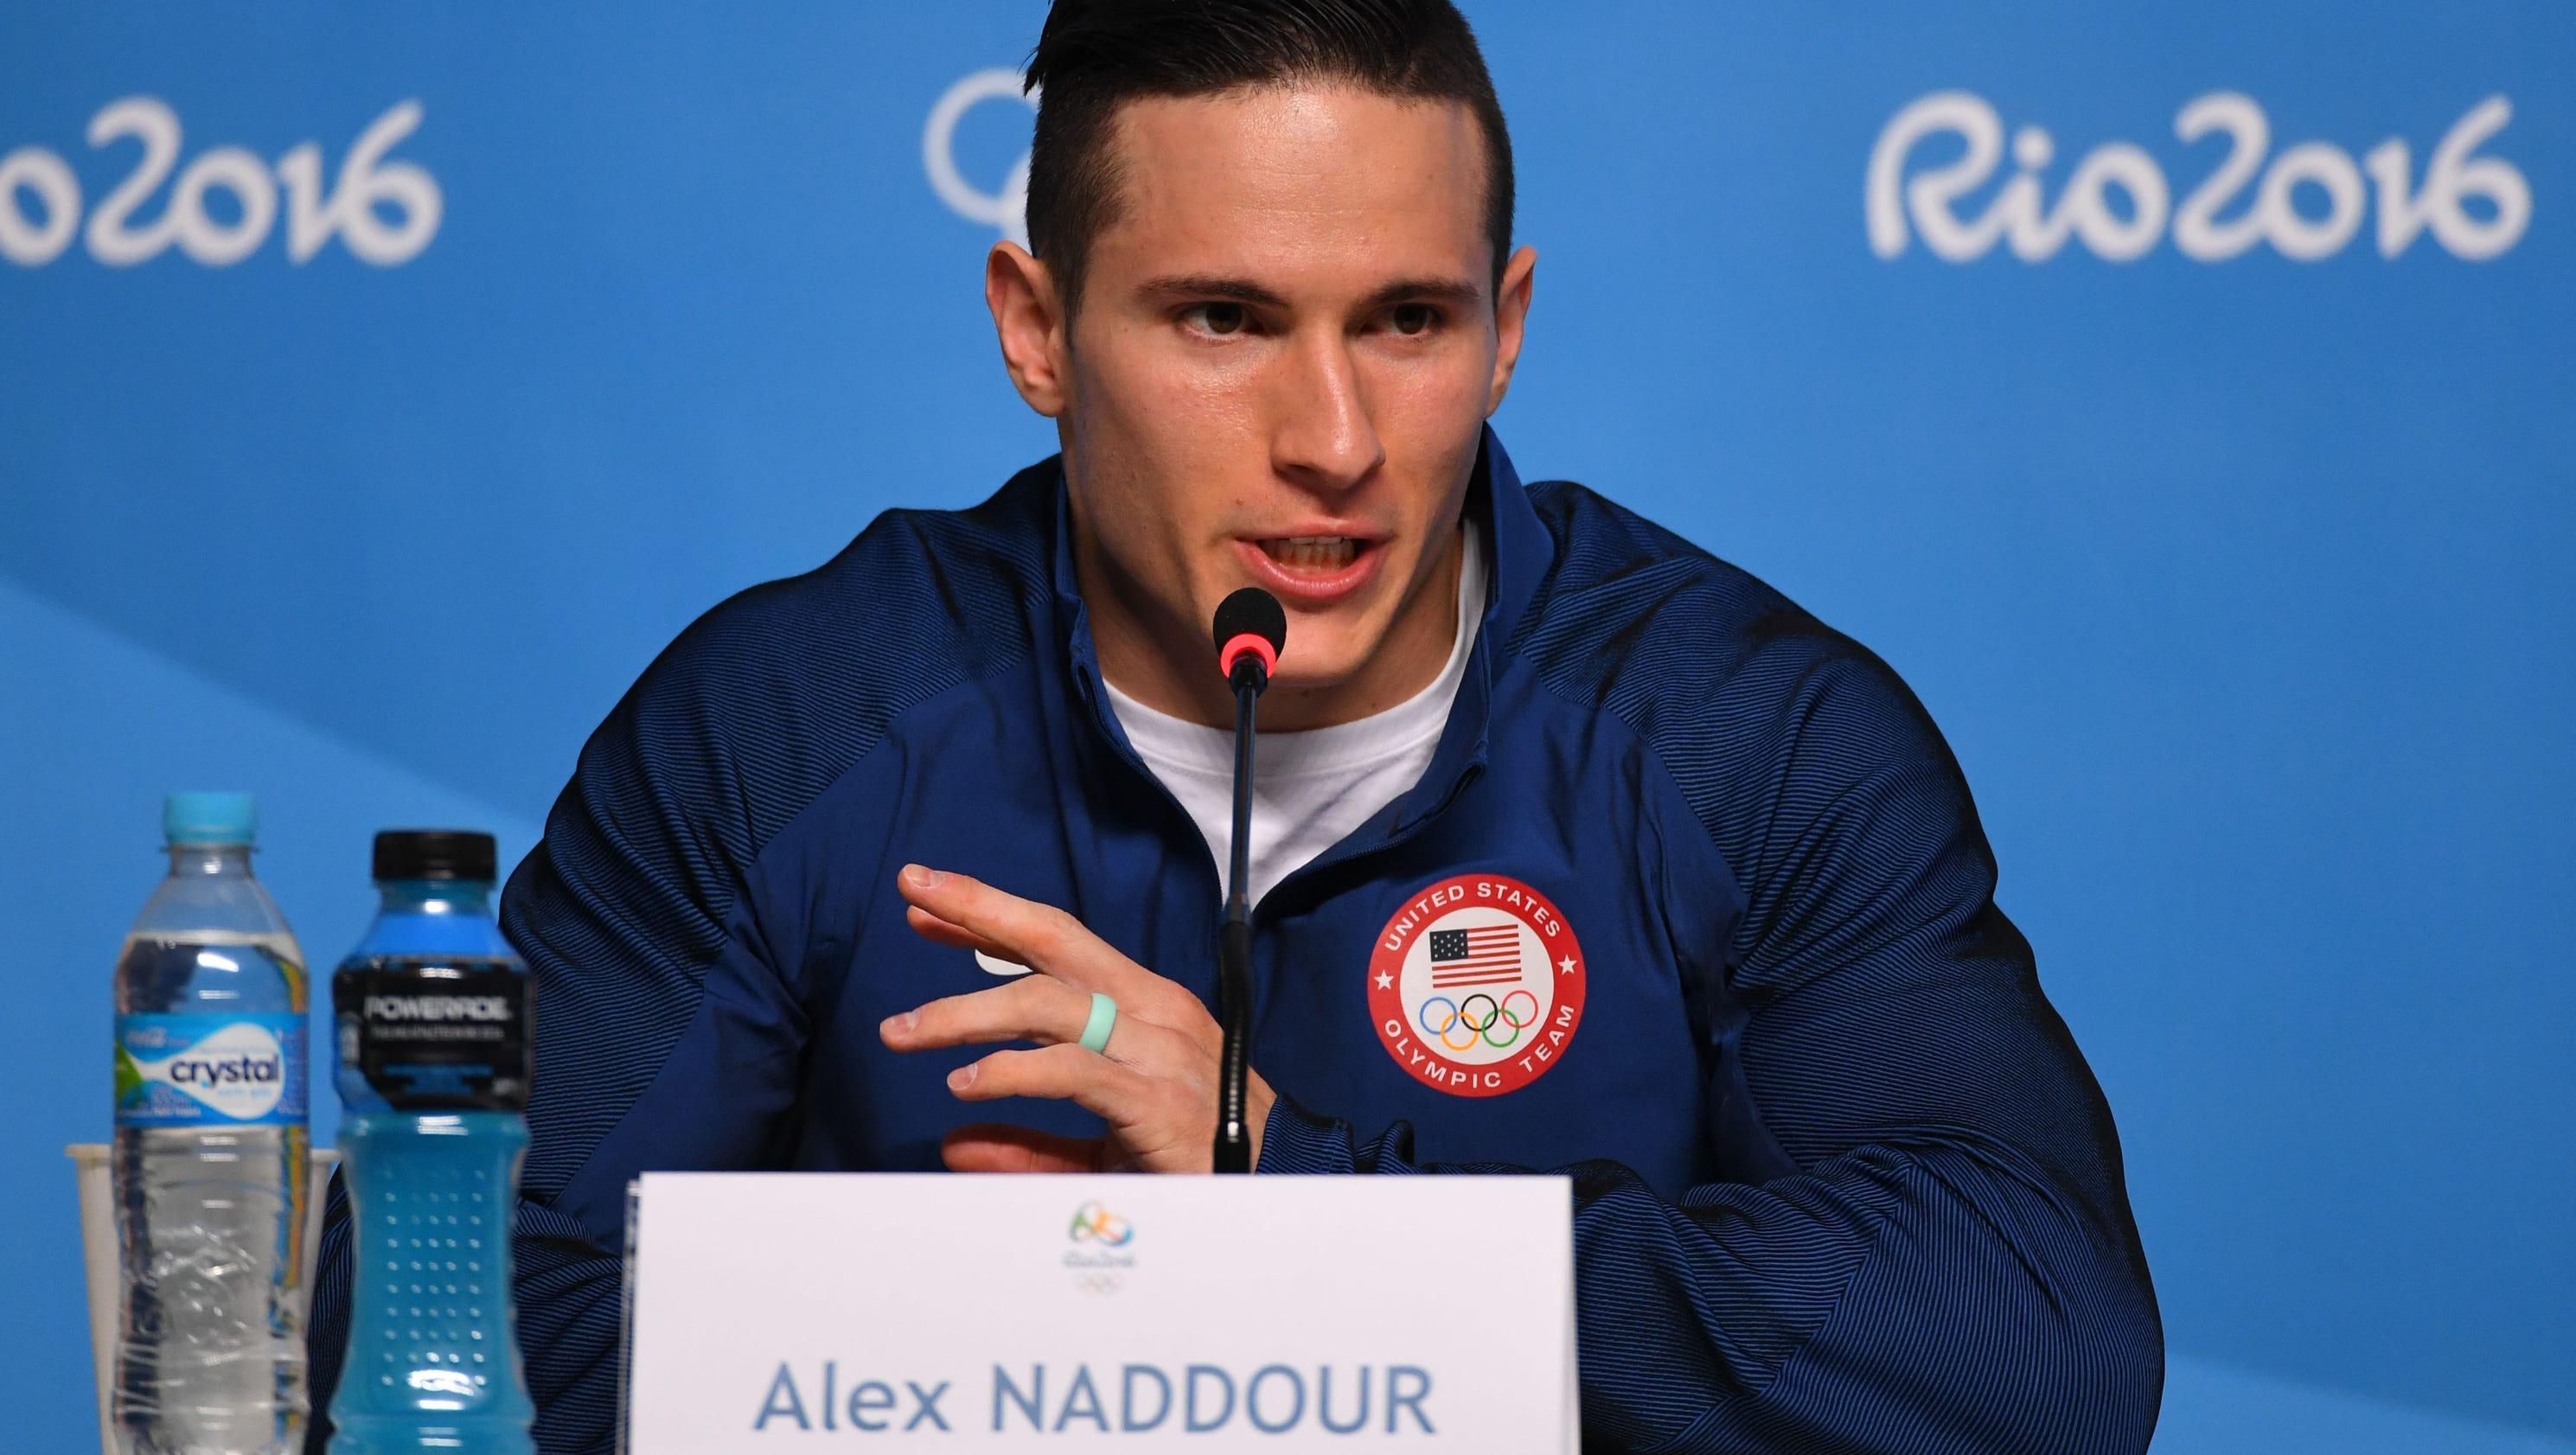 Cupping helps heal the USA men's Olympic gymnastics team: www.usatoday.com/story/sports/olympics/rio-2016/2016/08/06/USA-mens...